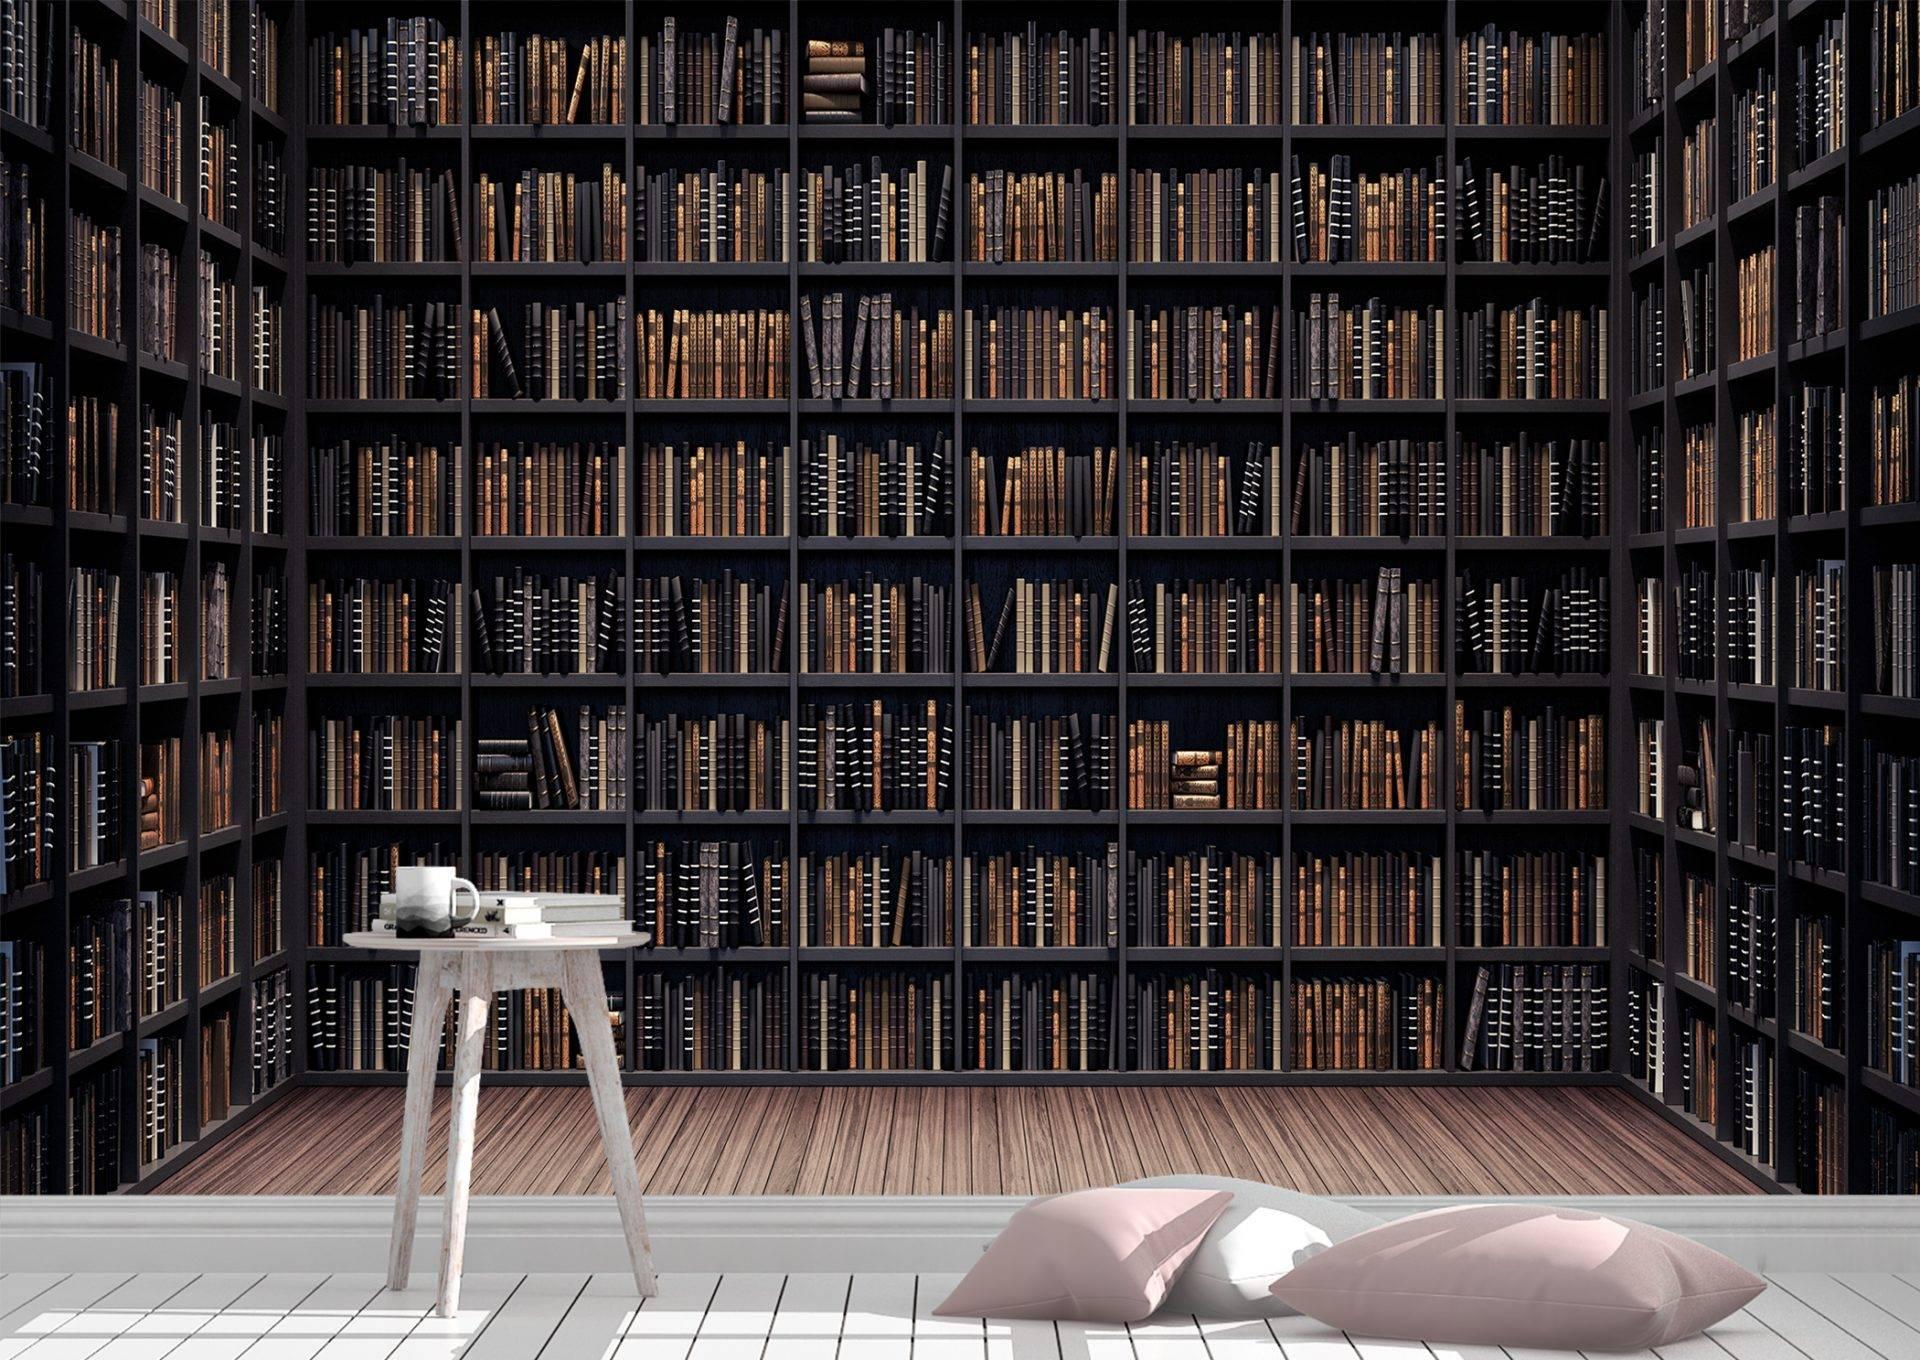 Bookshelves in the Library Wall Mural Photo Wallpaper UV Print Decal Art Décor